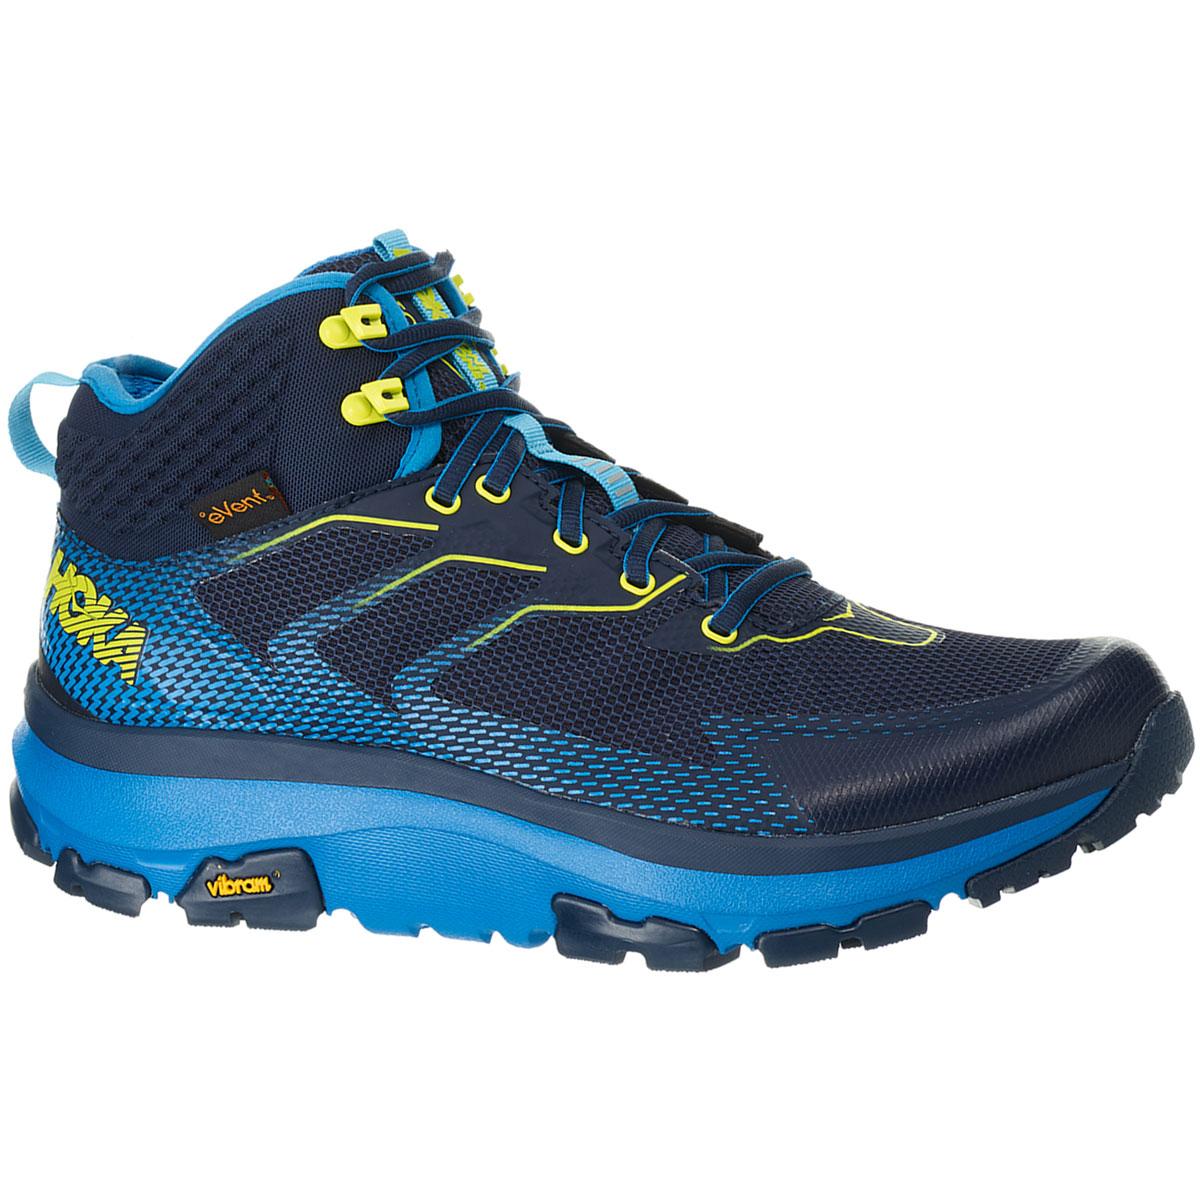 Men's Hoka One One Sky Toa Gore-Tex Trail Running Shoe - Color: Black Iris/Blue - Size: 7 - Width: Regular, Black Iris/Blue, large, image 2